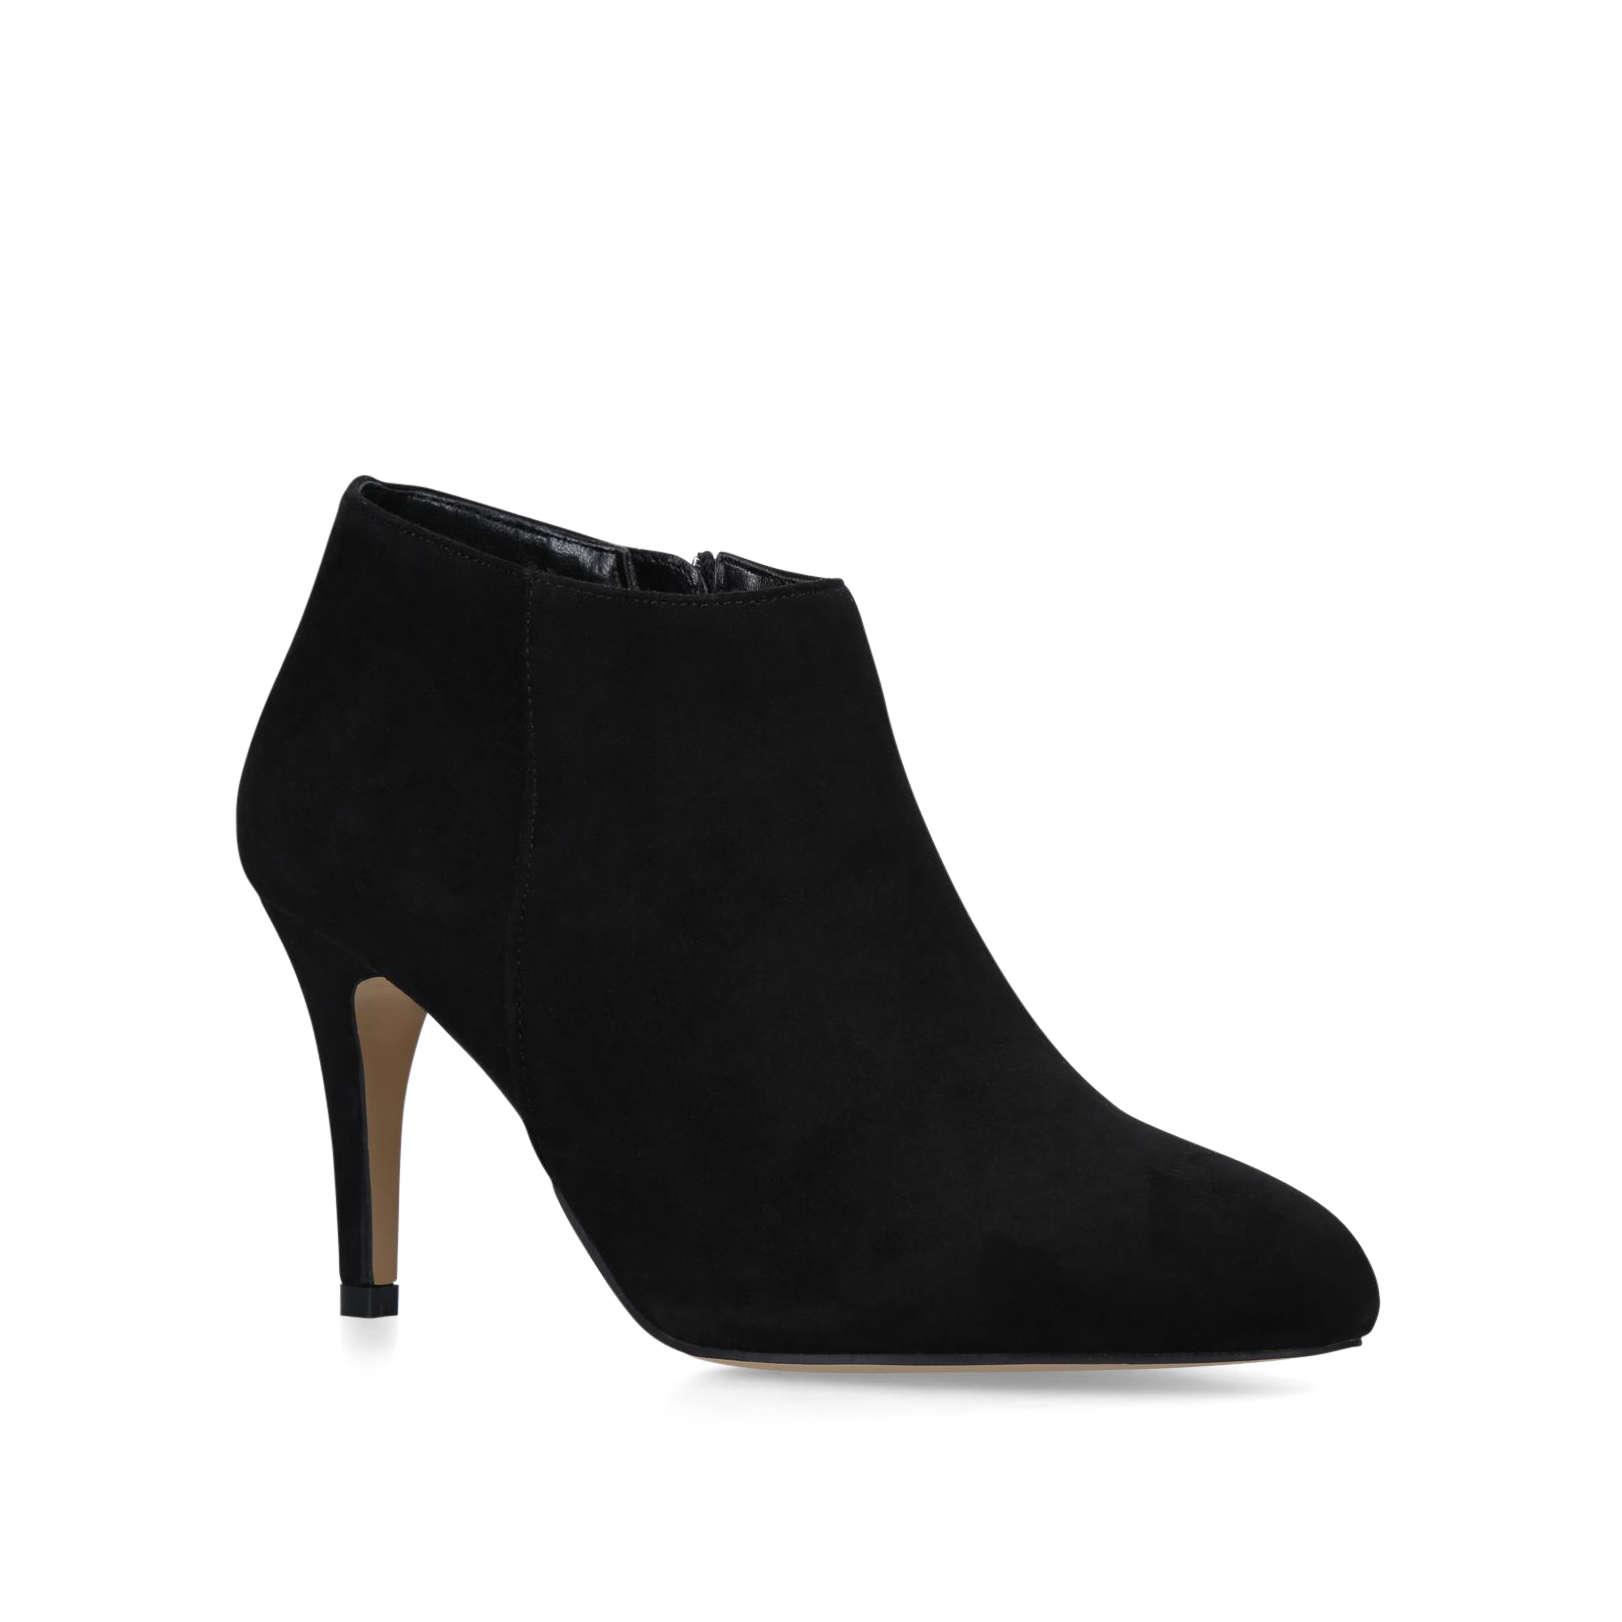 WIDE FIT SERENE - CARVELA Ankle Boots